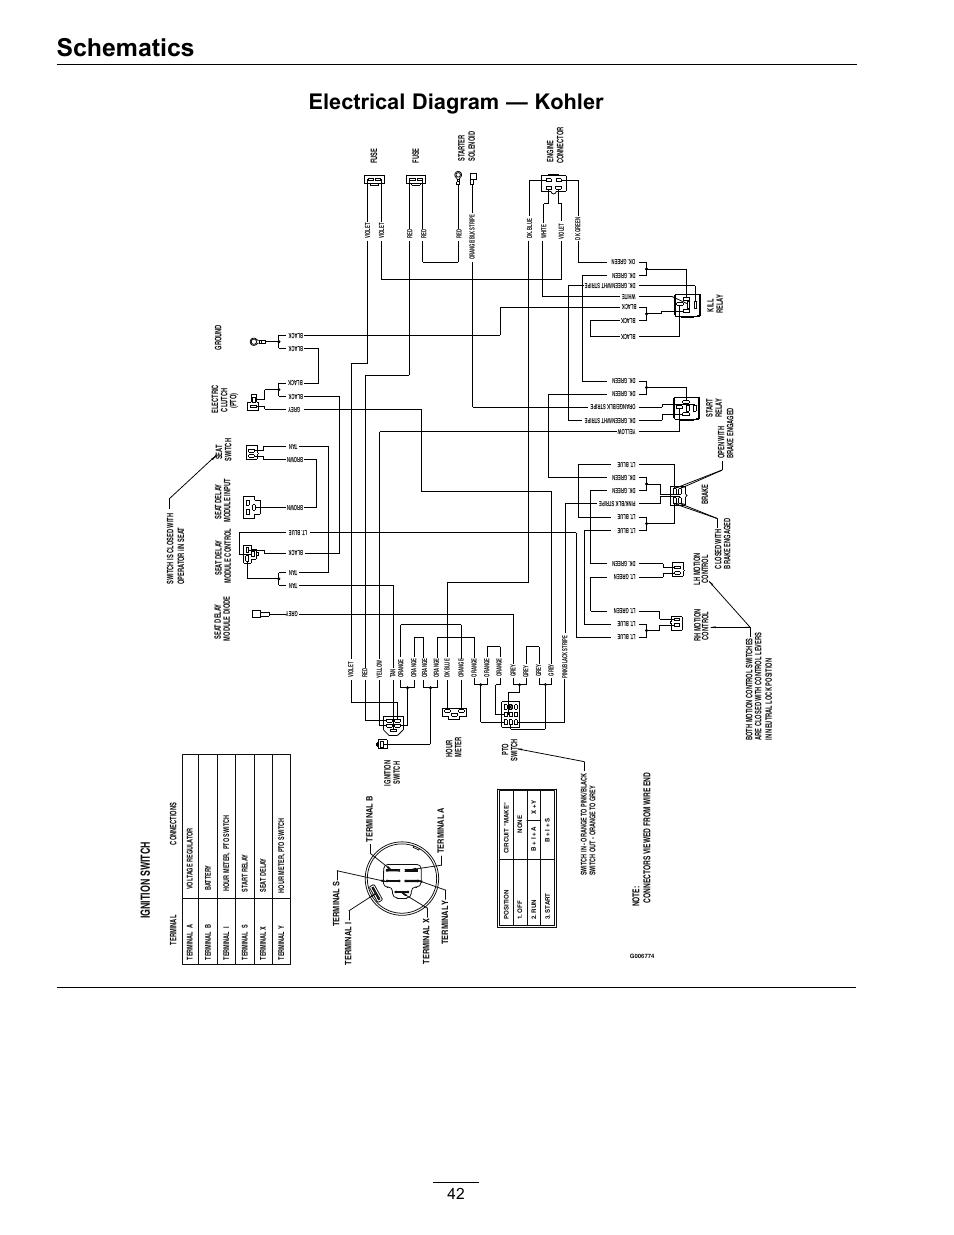 massey ferguson 35 wiring diagram vga cable 9 pin exmark schematics electrical u2014 kohler ignition switch exmarkschematics